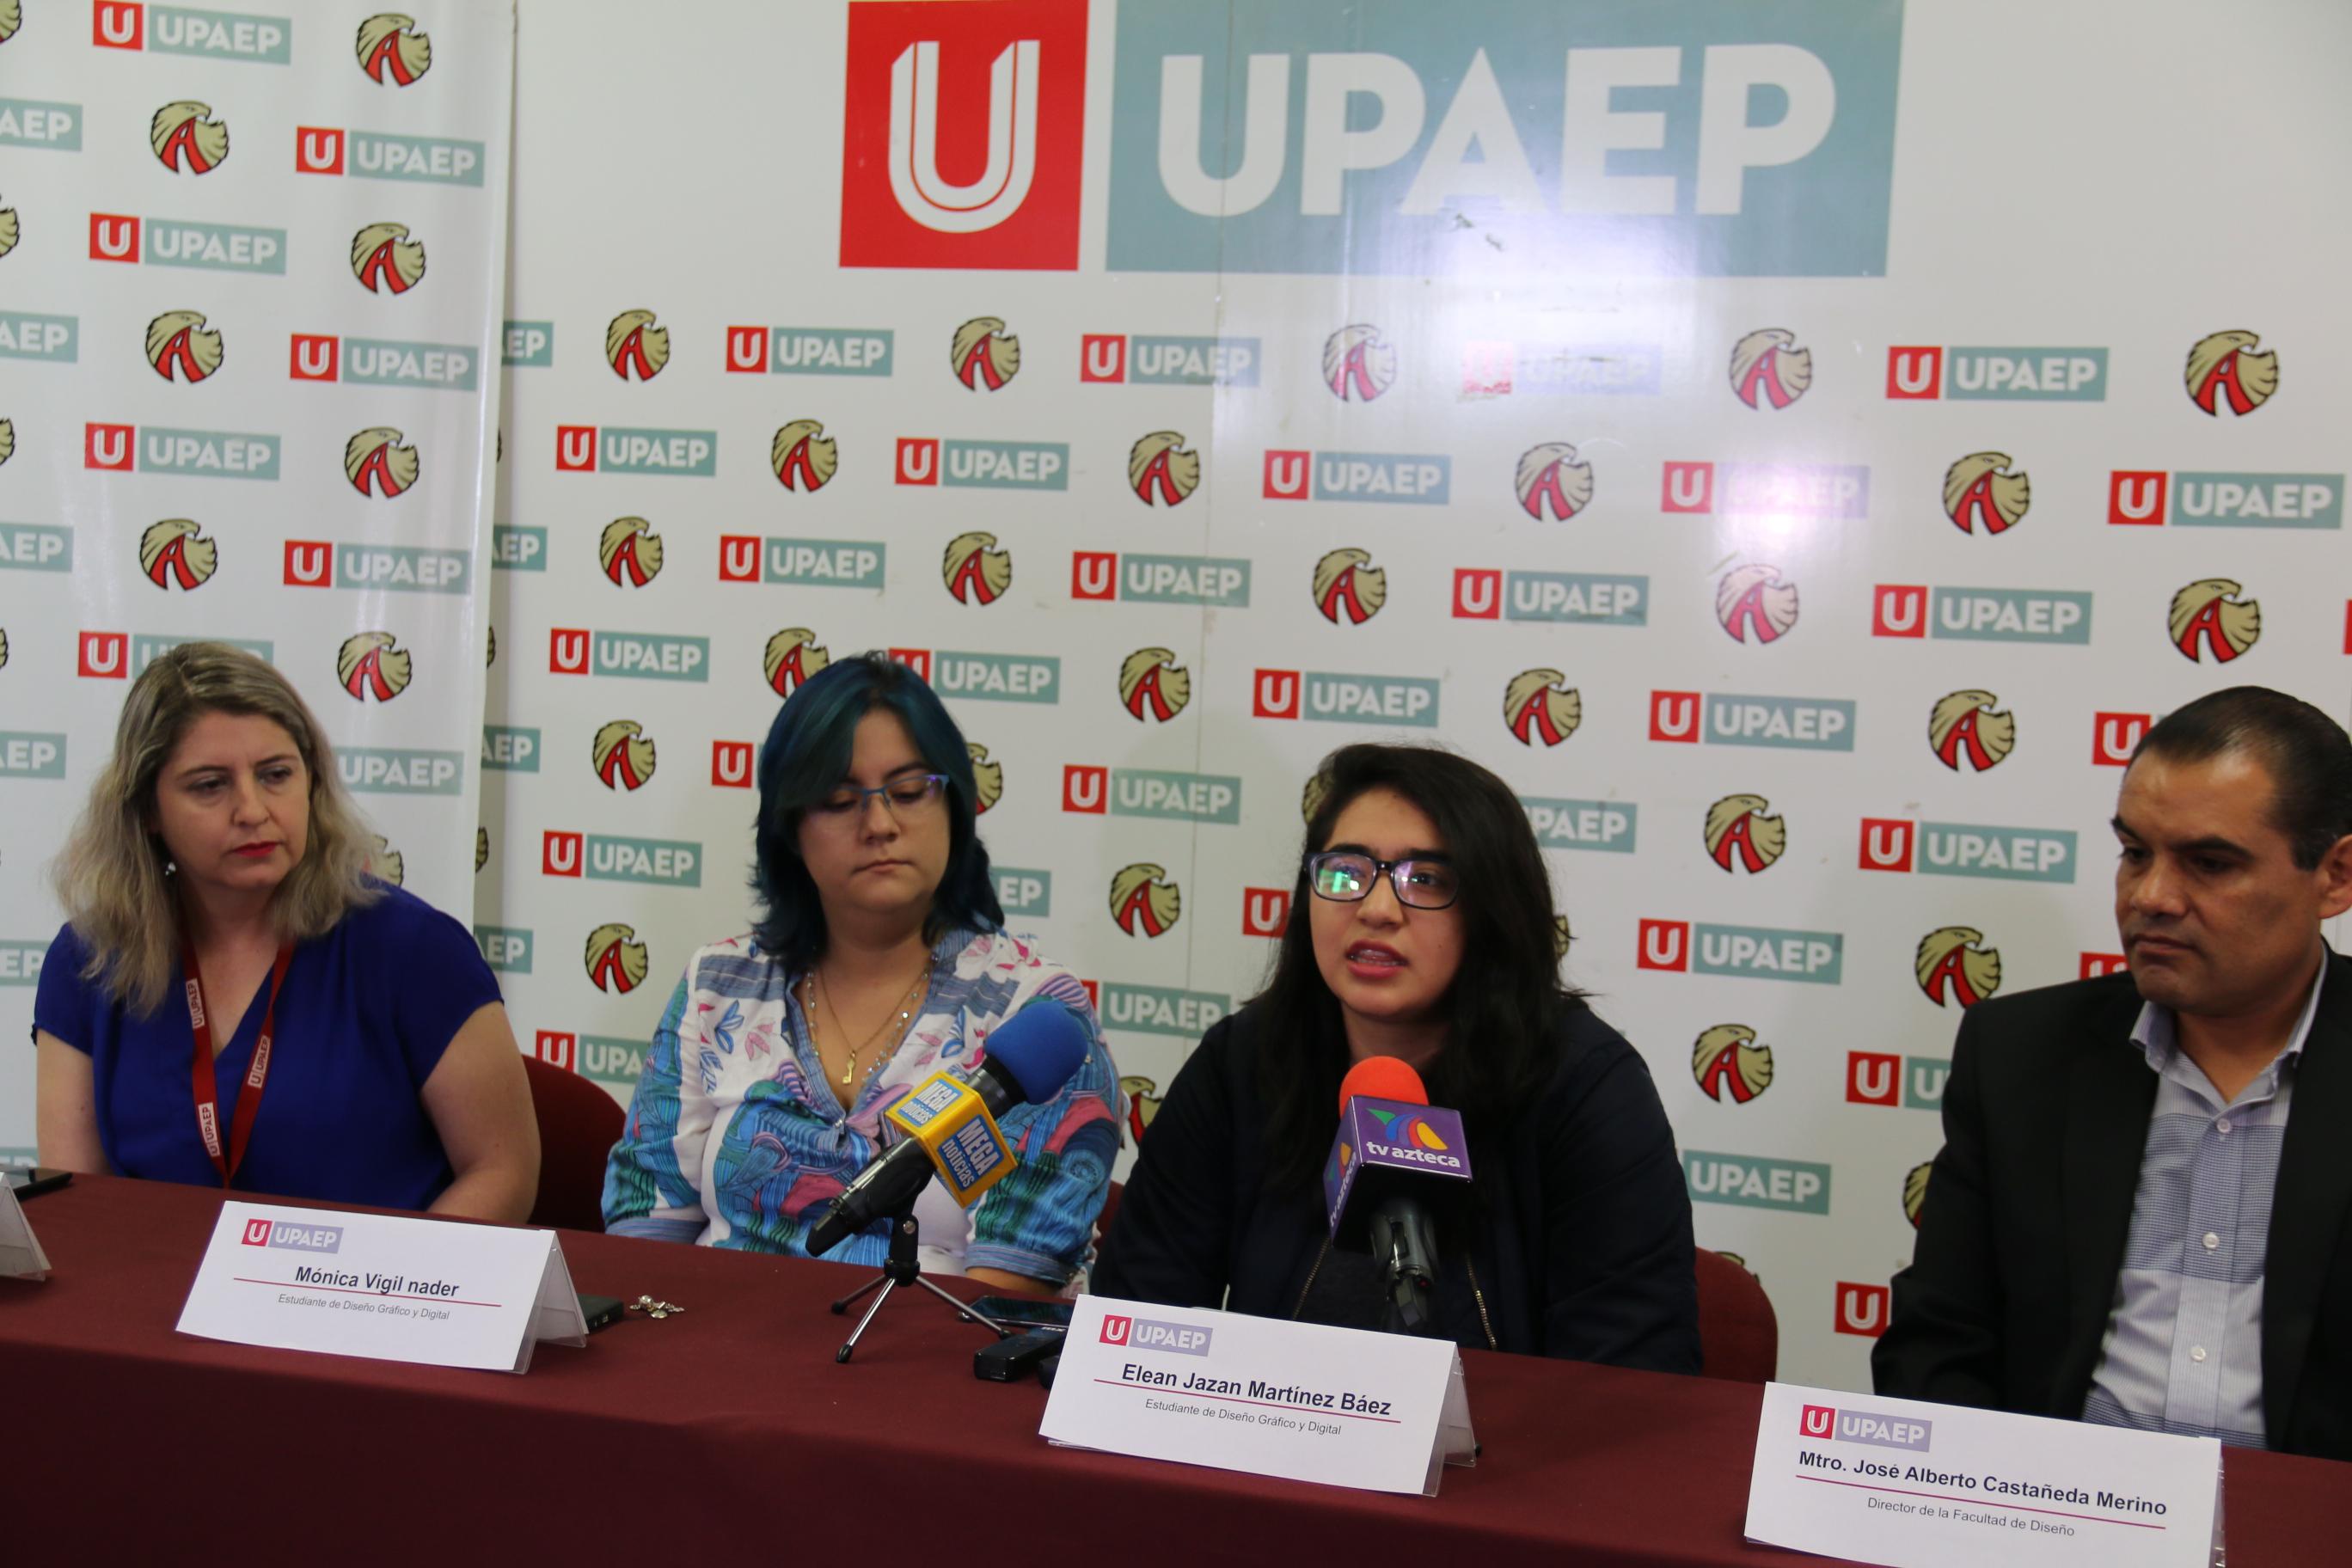 Proyectos de Diseño Gráfico UPAEP buscan impactar en comunidades